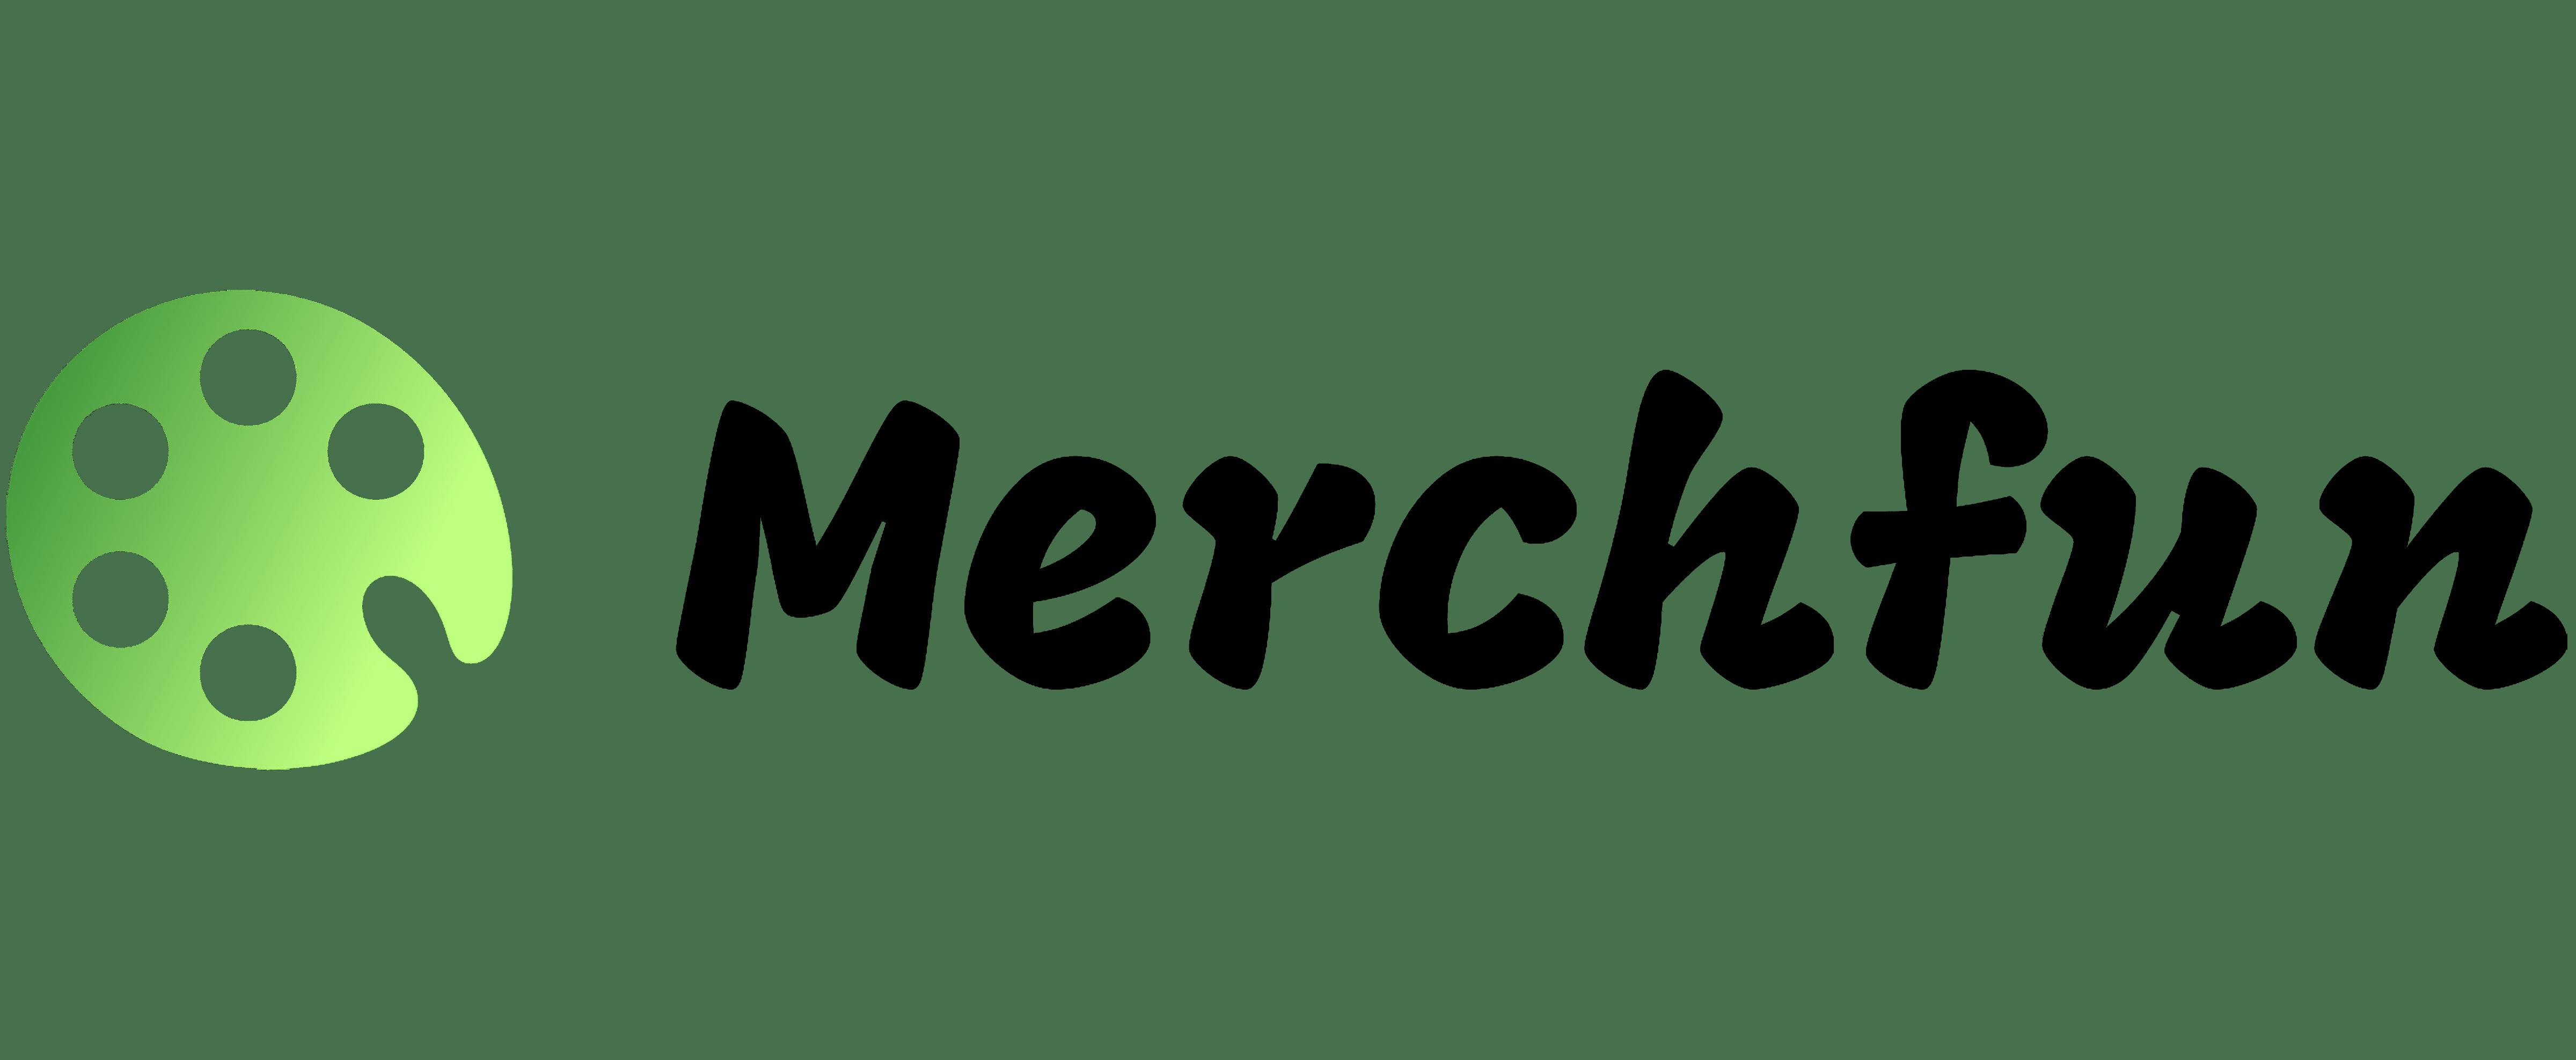 Merchfun